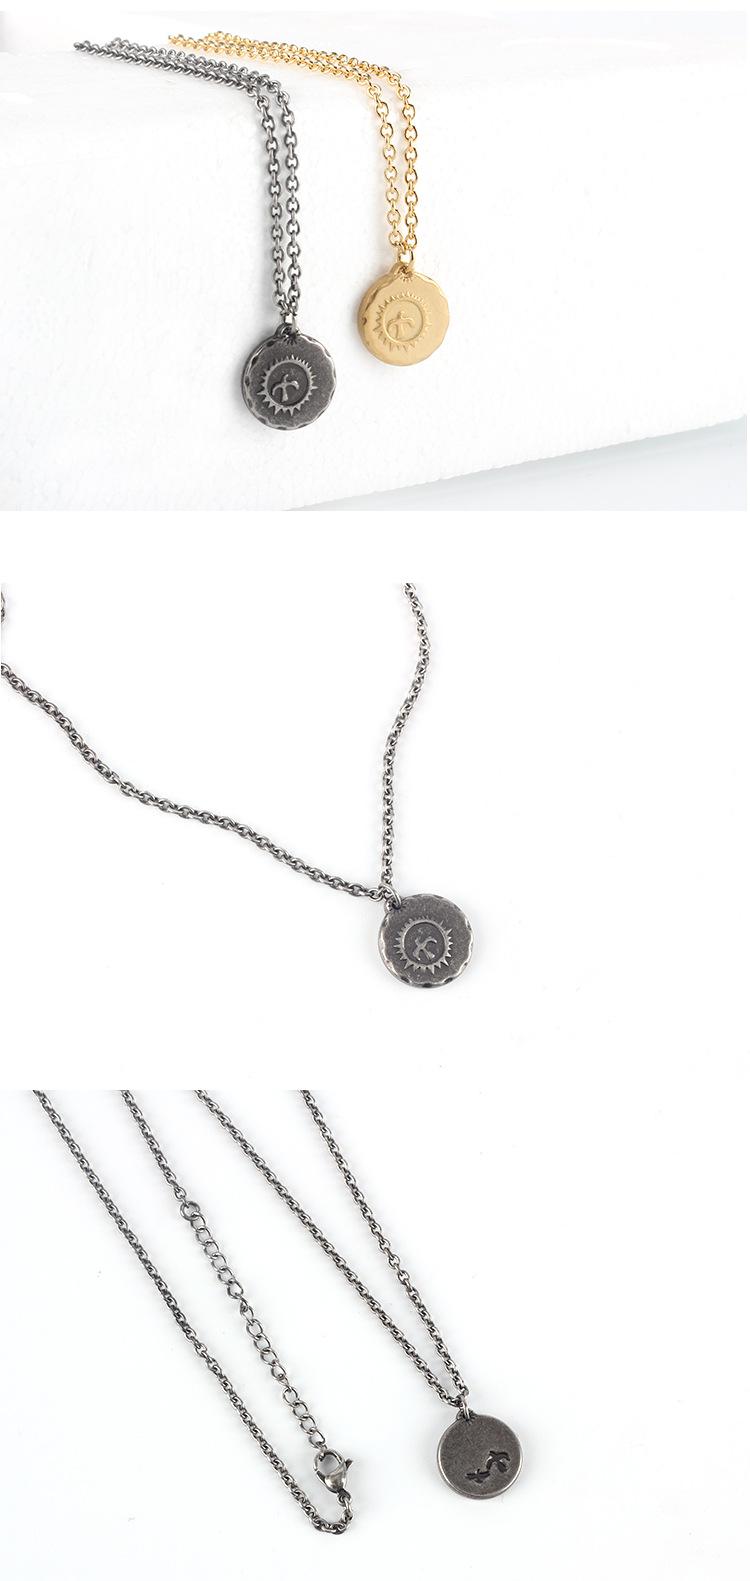 Medieval Gaucho Sun Bird Small Gold Cake Pendant Necklace Simple Retro Couple Sweater Chain Jewelry 2